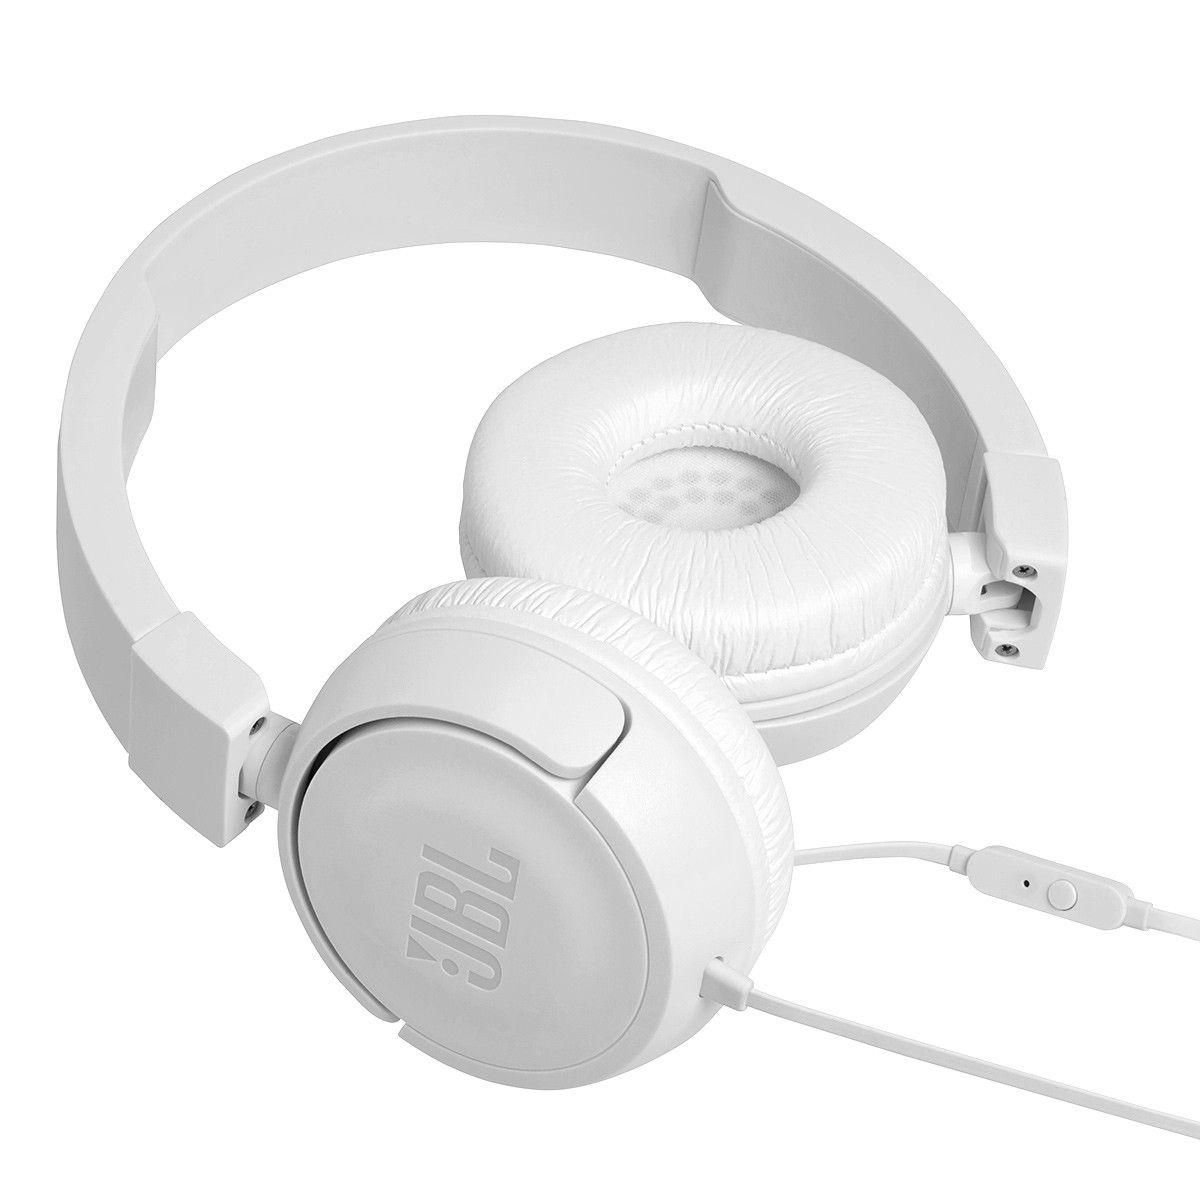 Fone de ouvido JBL T450 - Tecnologia Pure Bass, Dobrável, Microfone Embutido - Branco